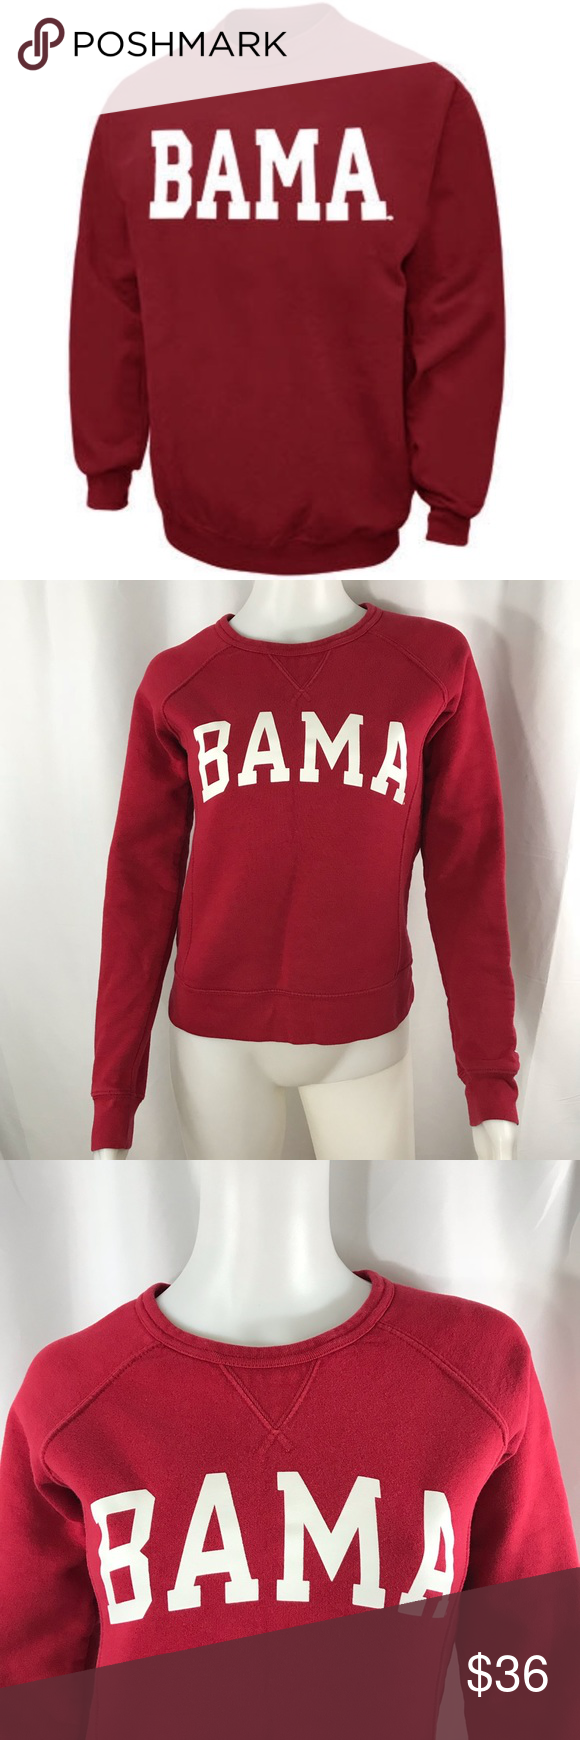 45 Alabama Burgundy White Logo Sweatshirt Xs Sweatshirts Clothes Design Sweatshirt Tops [ 1740 x 580 Pixel ]